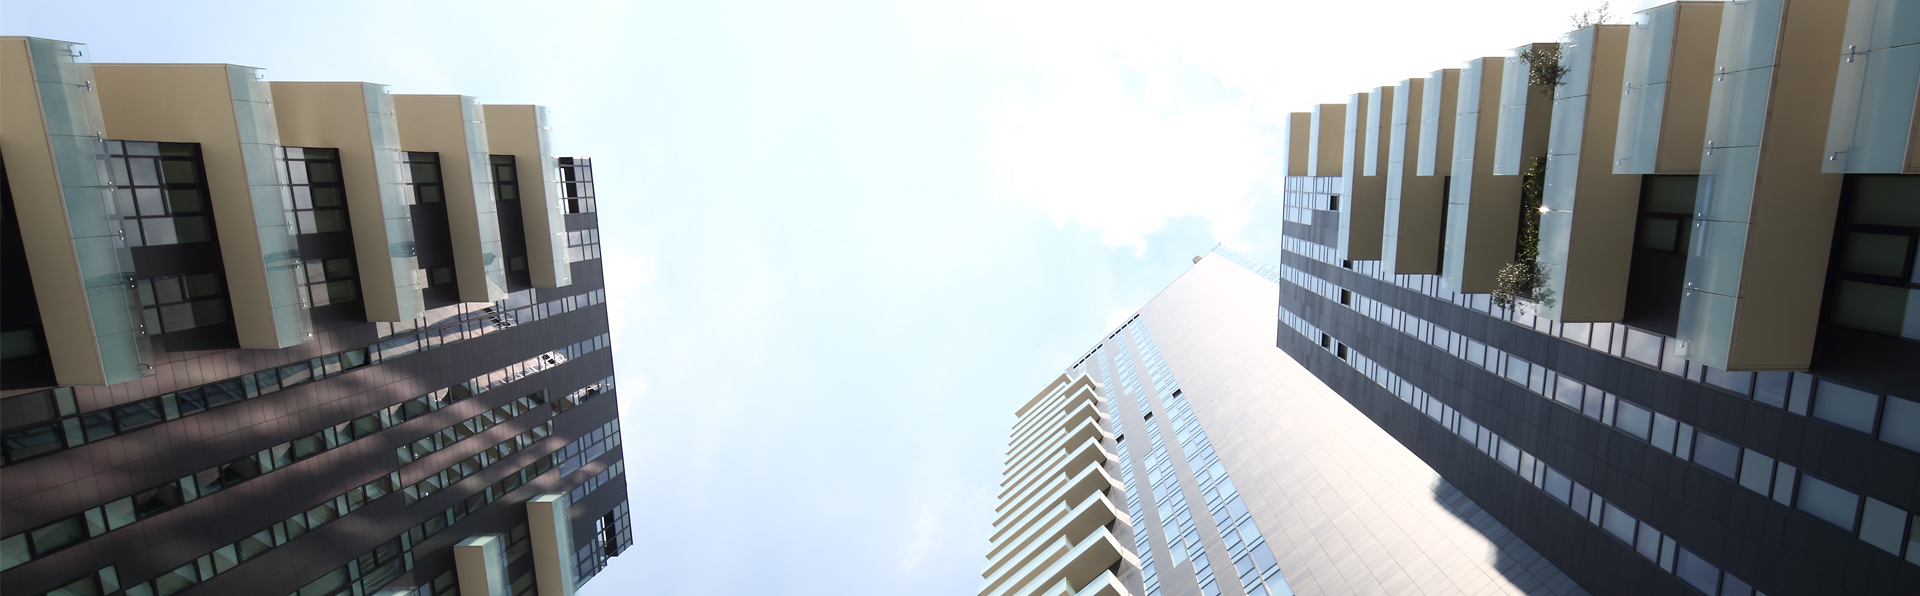 cmb-porta-nuova-varesine-slide